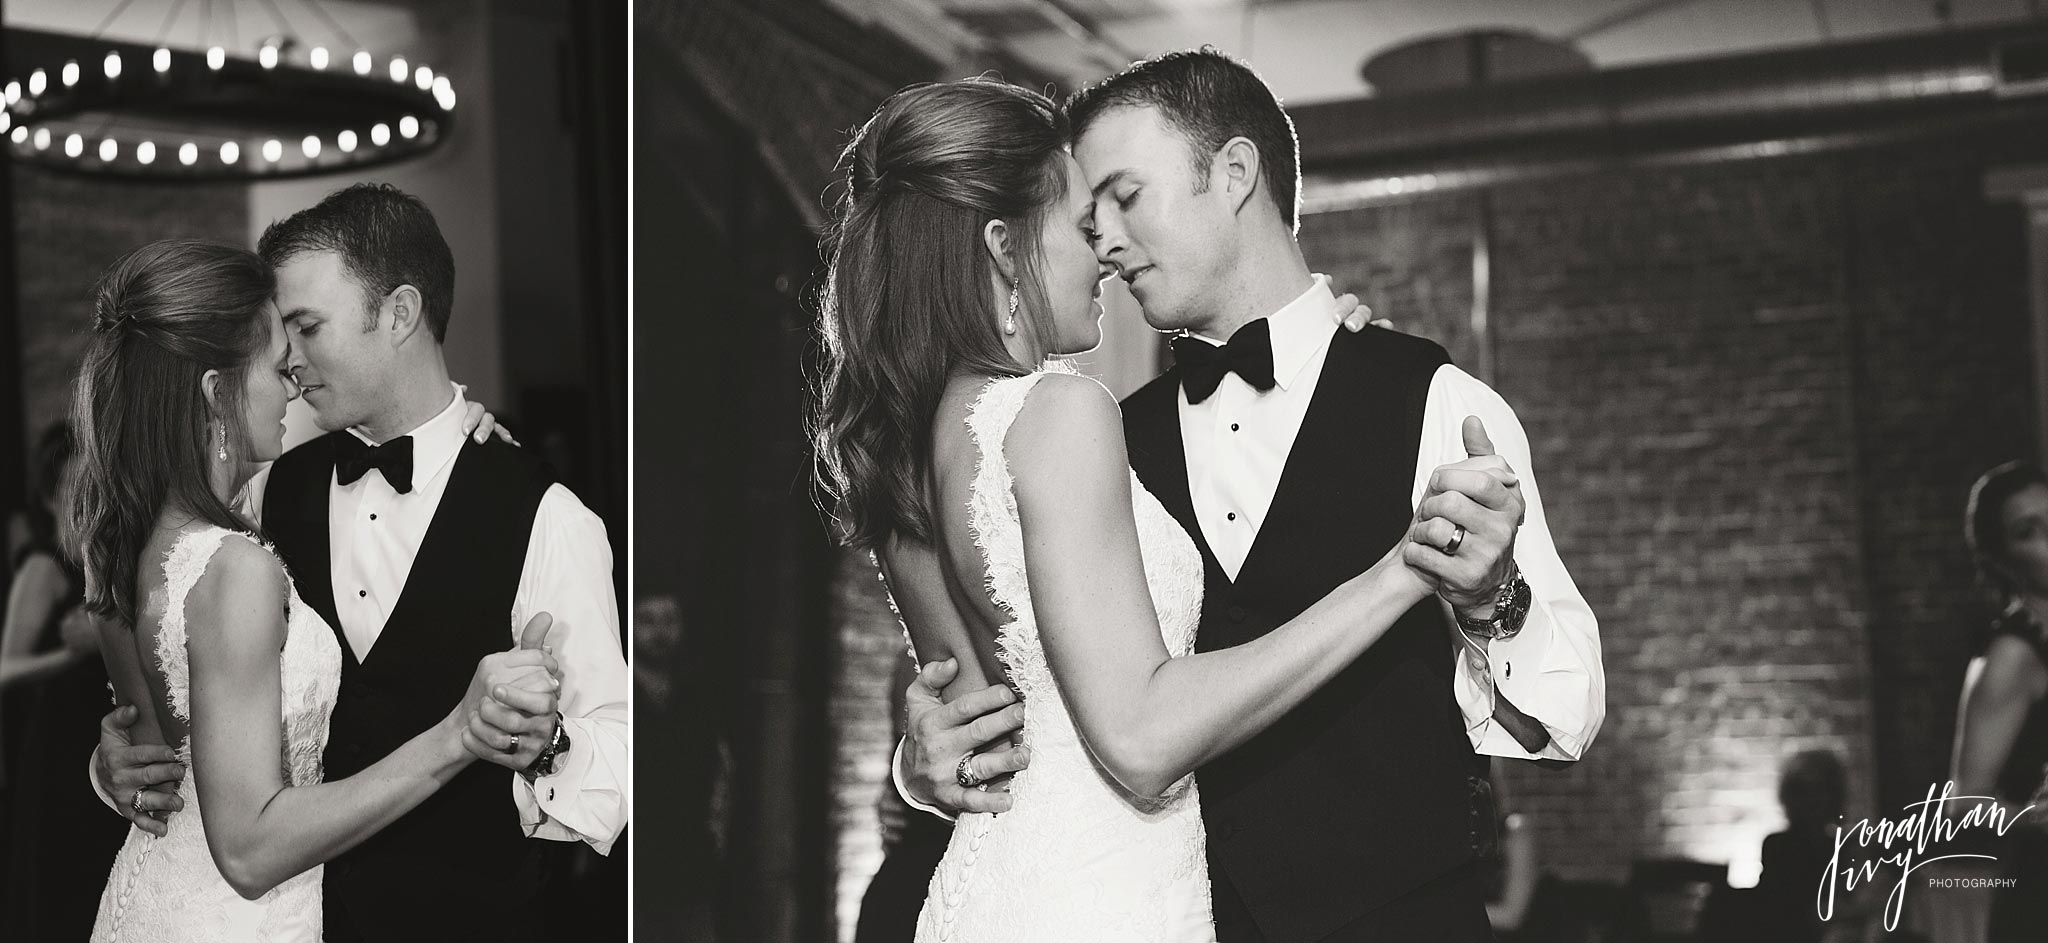 Romantic first dance bride groom